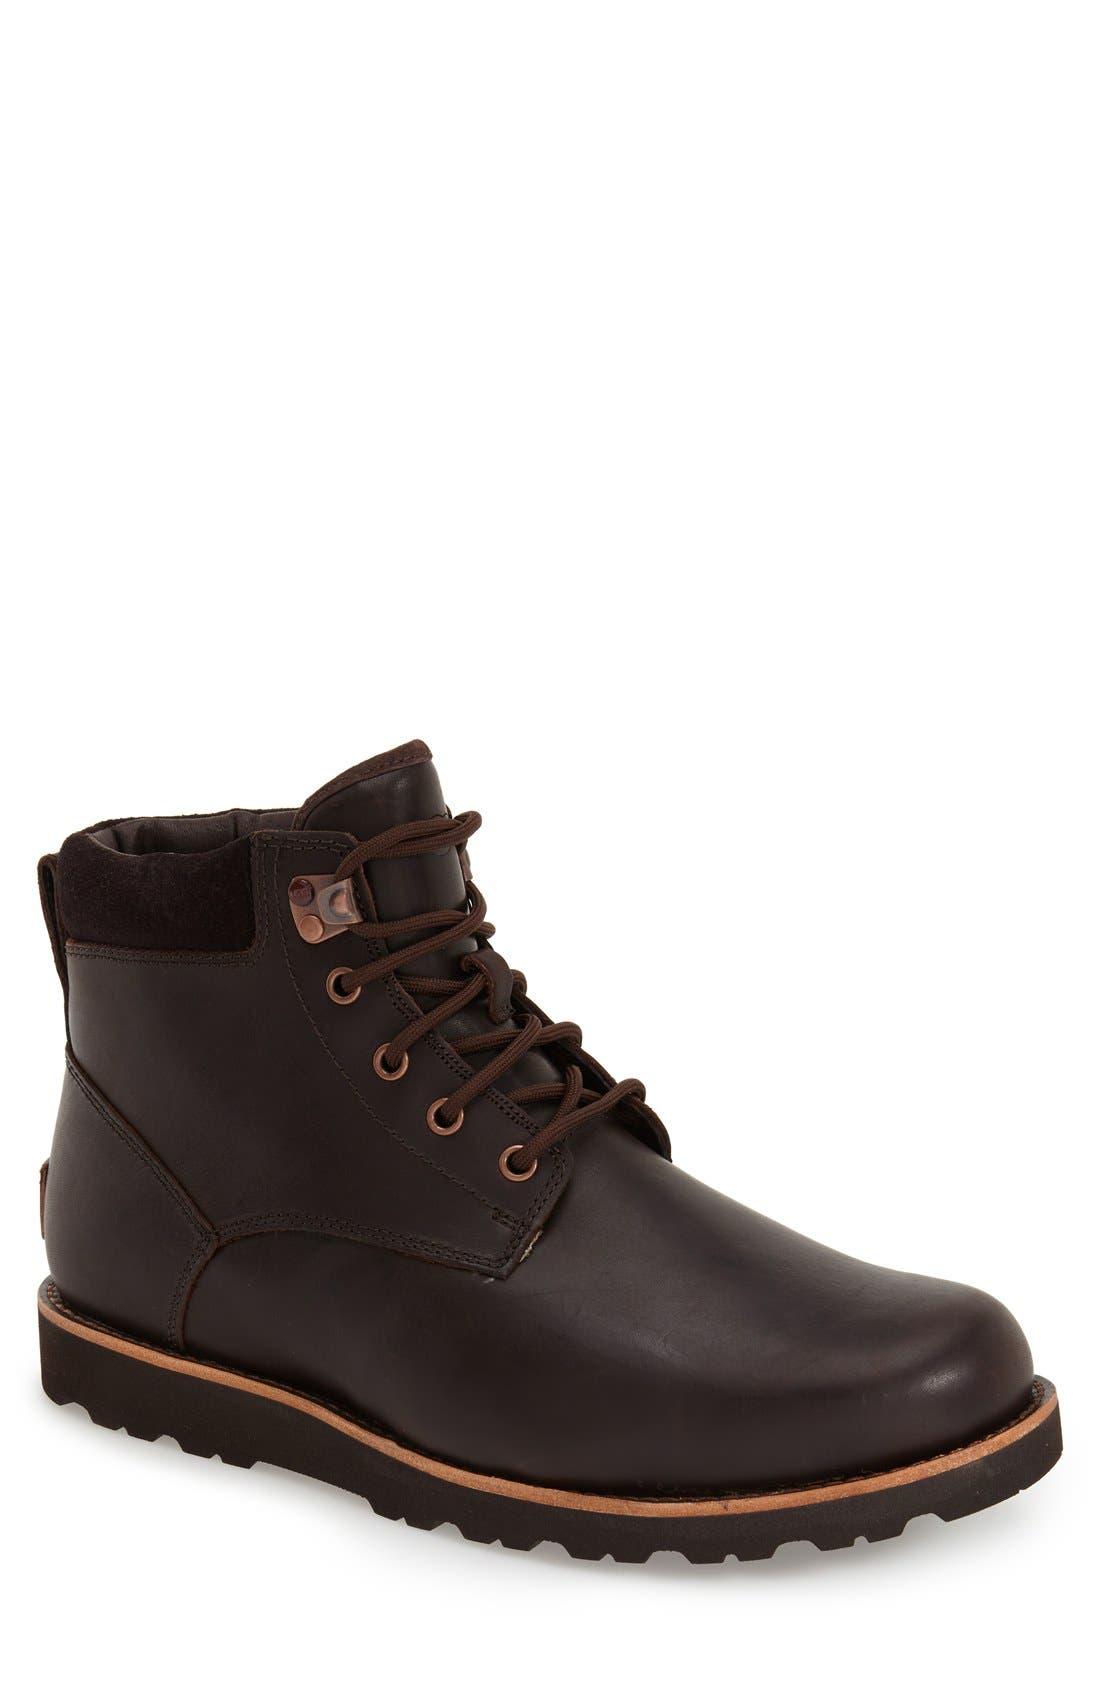 Seton Waterproof Chukka Boot,                         Main,                         color, STOUT